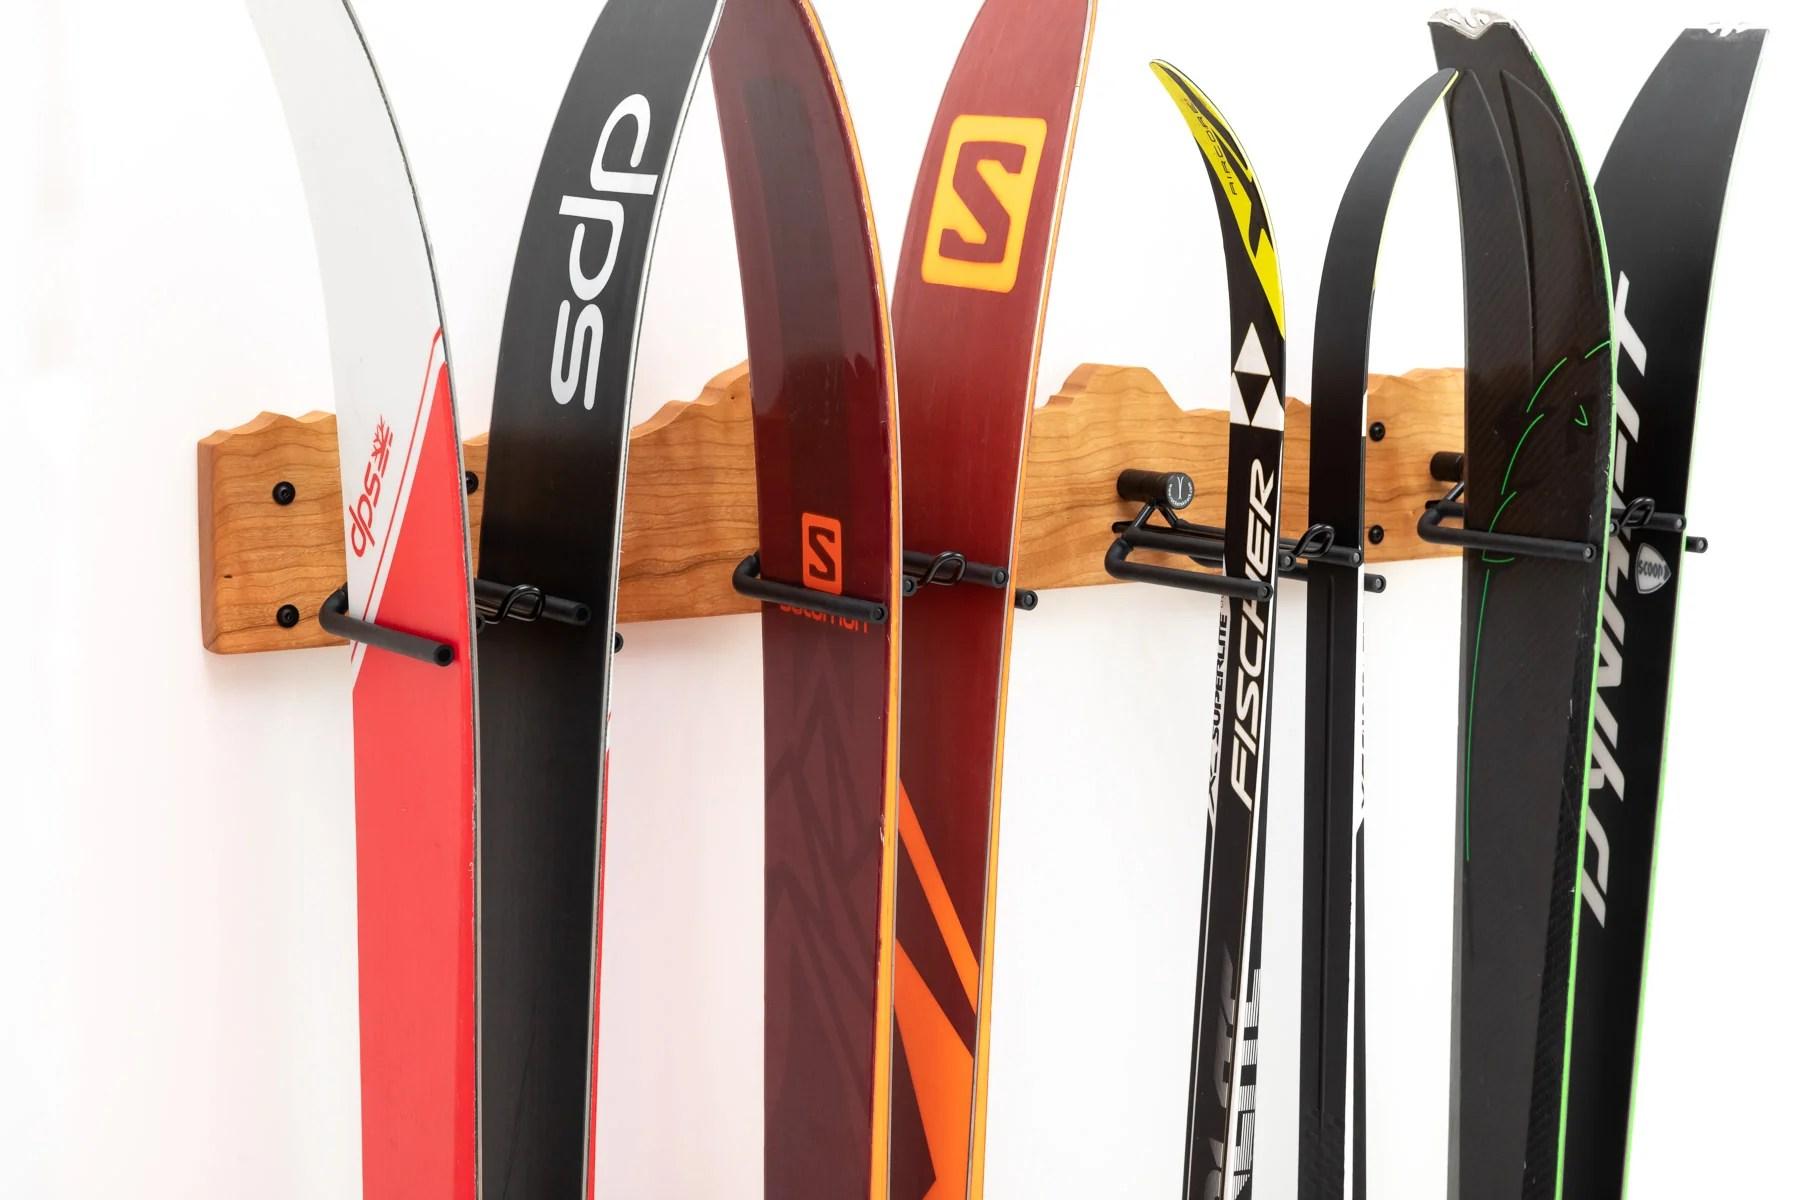 rocker ski rack ski board storage for your home garage or cabin